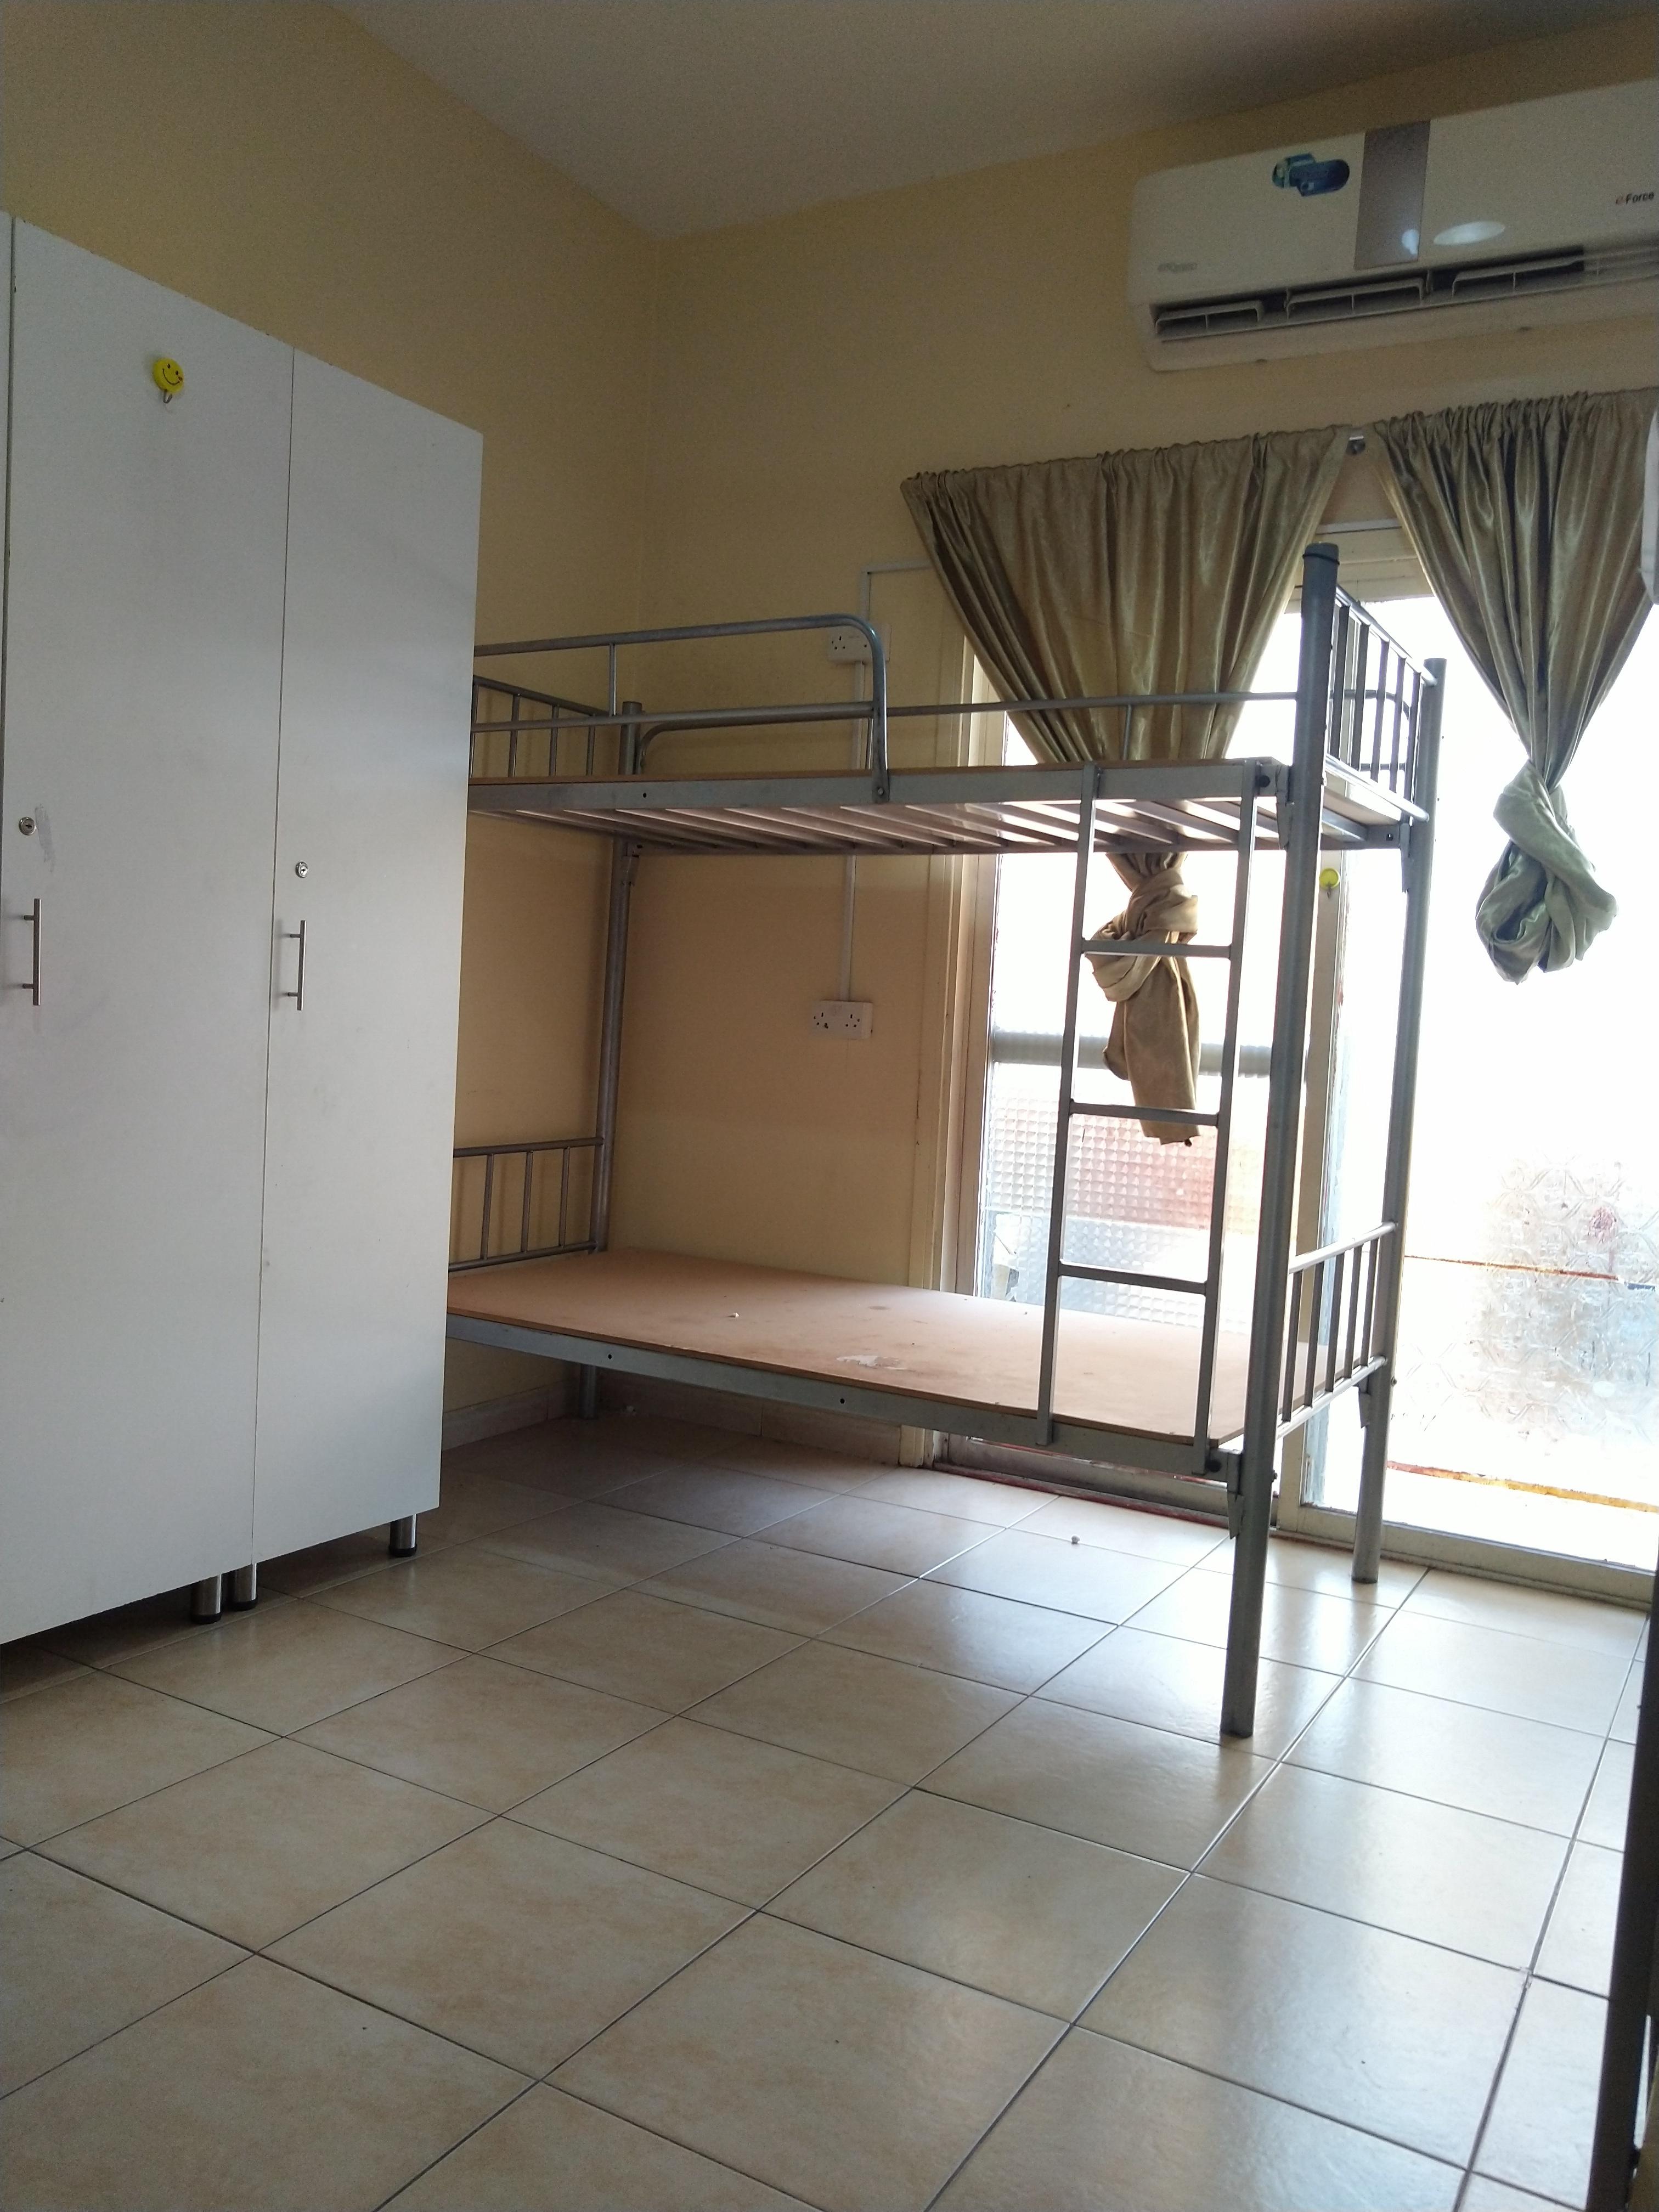 AVAILABLE ROOM FOR COUPLE/ LADIES BED SPACE AT BUR DUBAI DHS.600 NEAR AL GHUBAIBA METRO STATION.